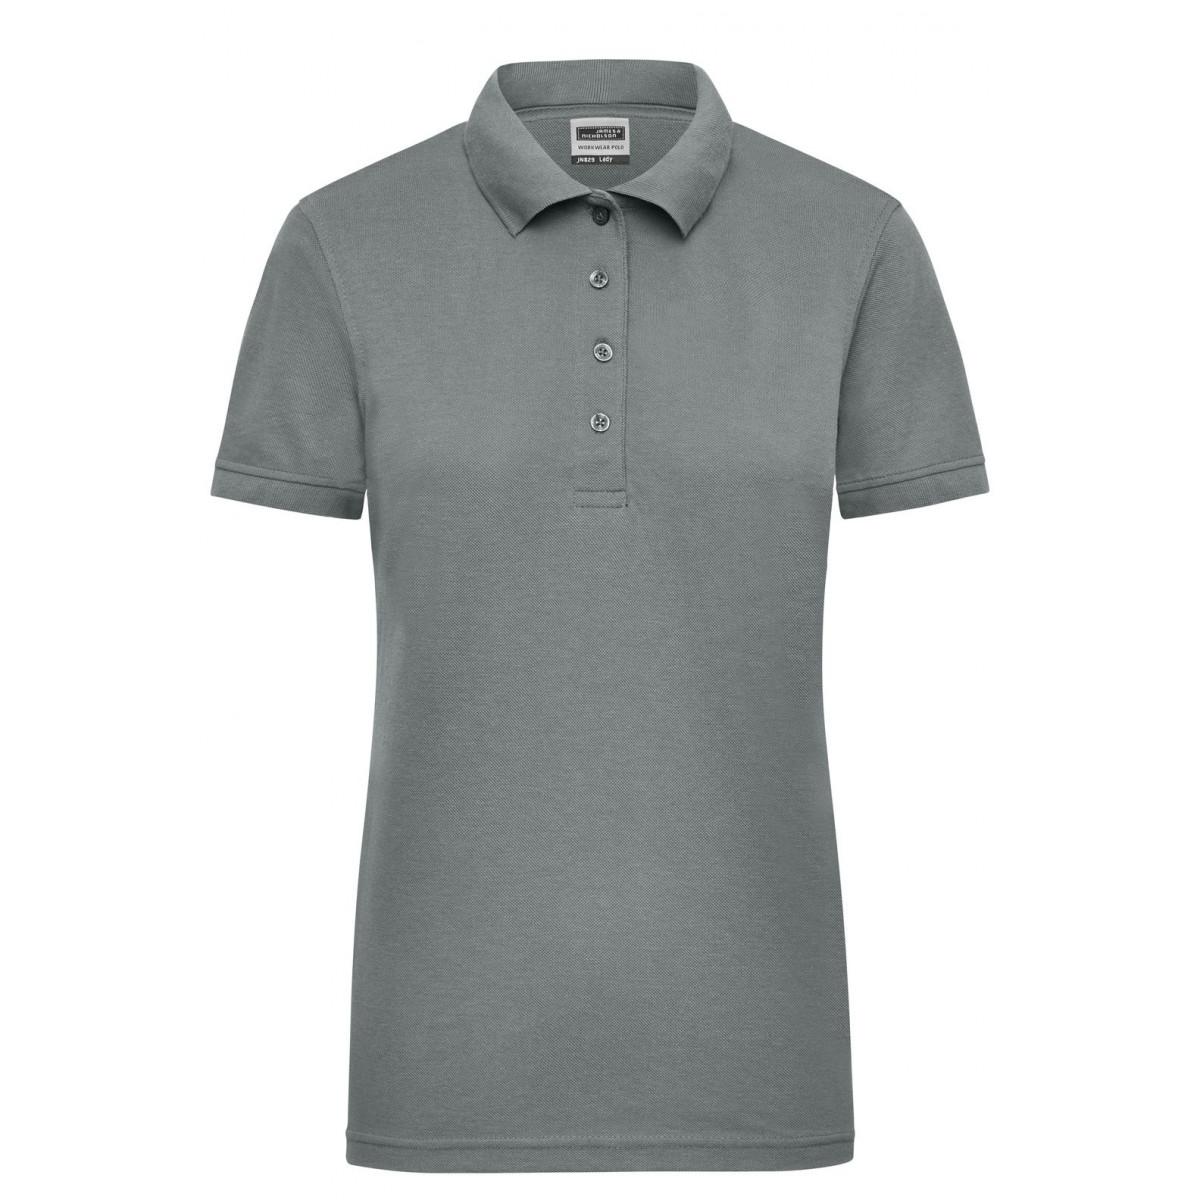 Рубашка поло женская JN829 Ladies Workwear Polo - Темно-серый